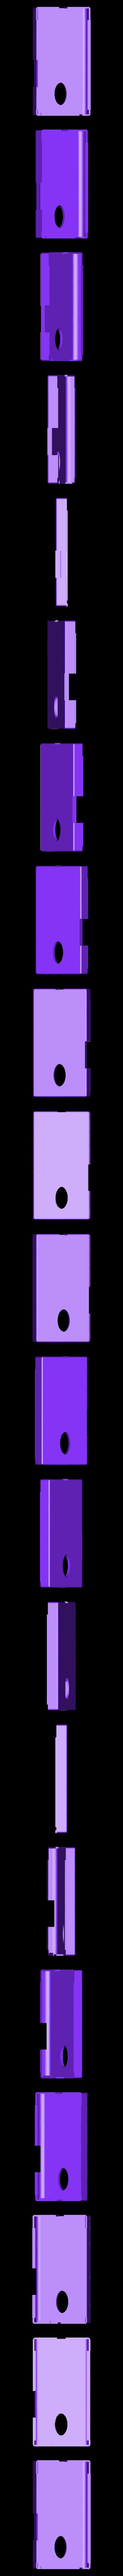 droid maxx2 case.stl Download STL file Droid Maxx 2 Phone Case • 3D printer object, mowiarde